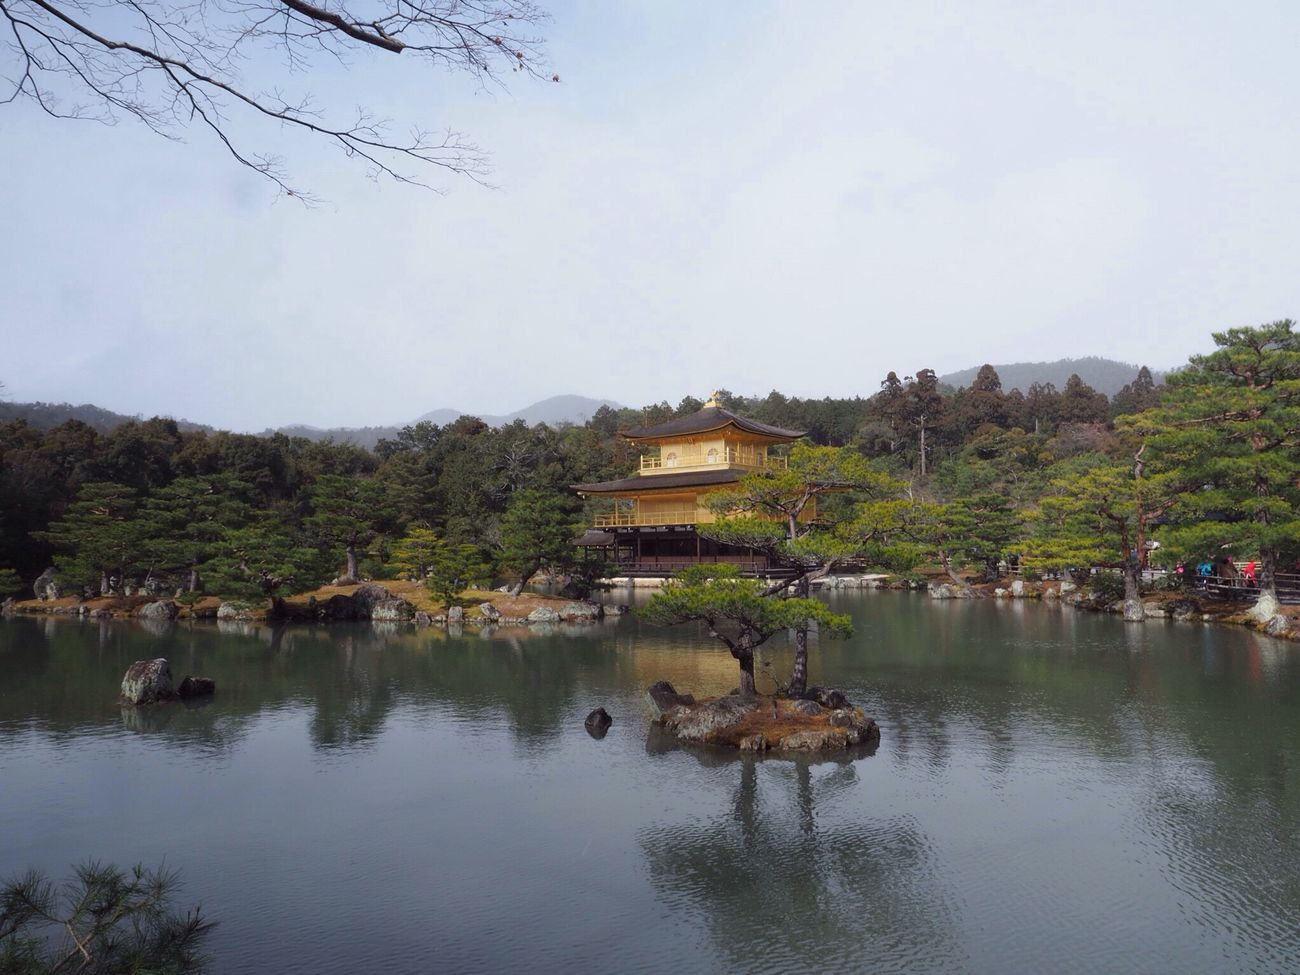 Kyoto Japan Kinkakuji Kinkakuji Temple Temple Rokuon-ji Golden Pond Winter Famous Places Olympus PEN-F 京都 日本 金閣寺 鹿苑寺 池 金 冬